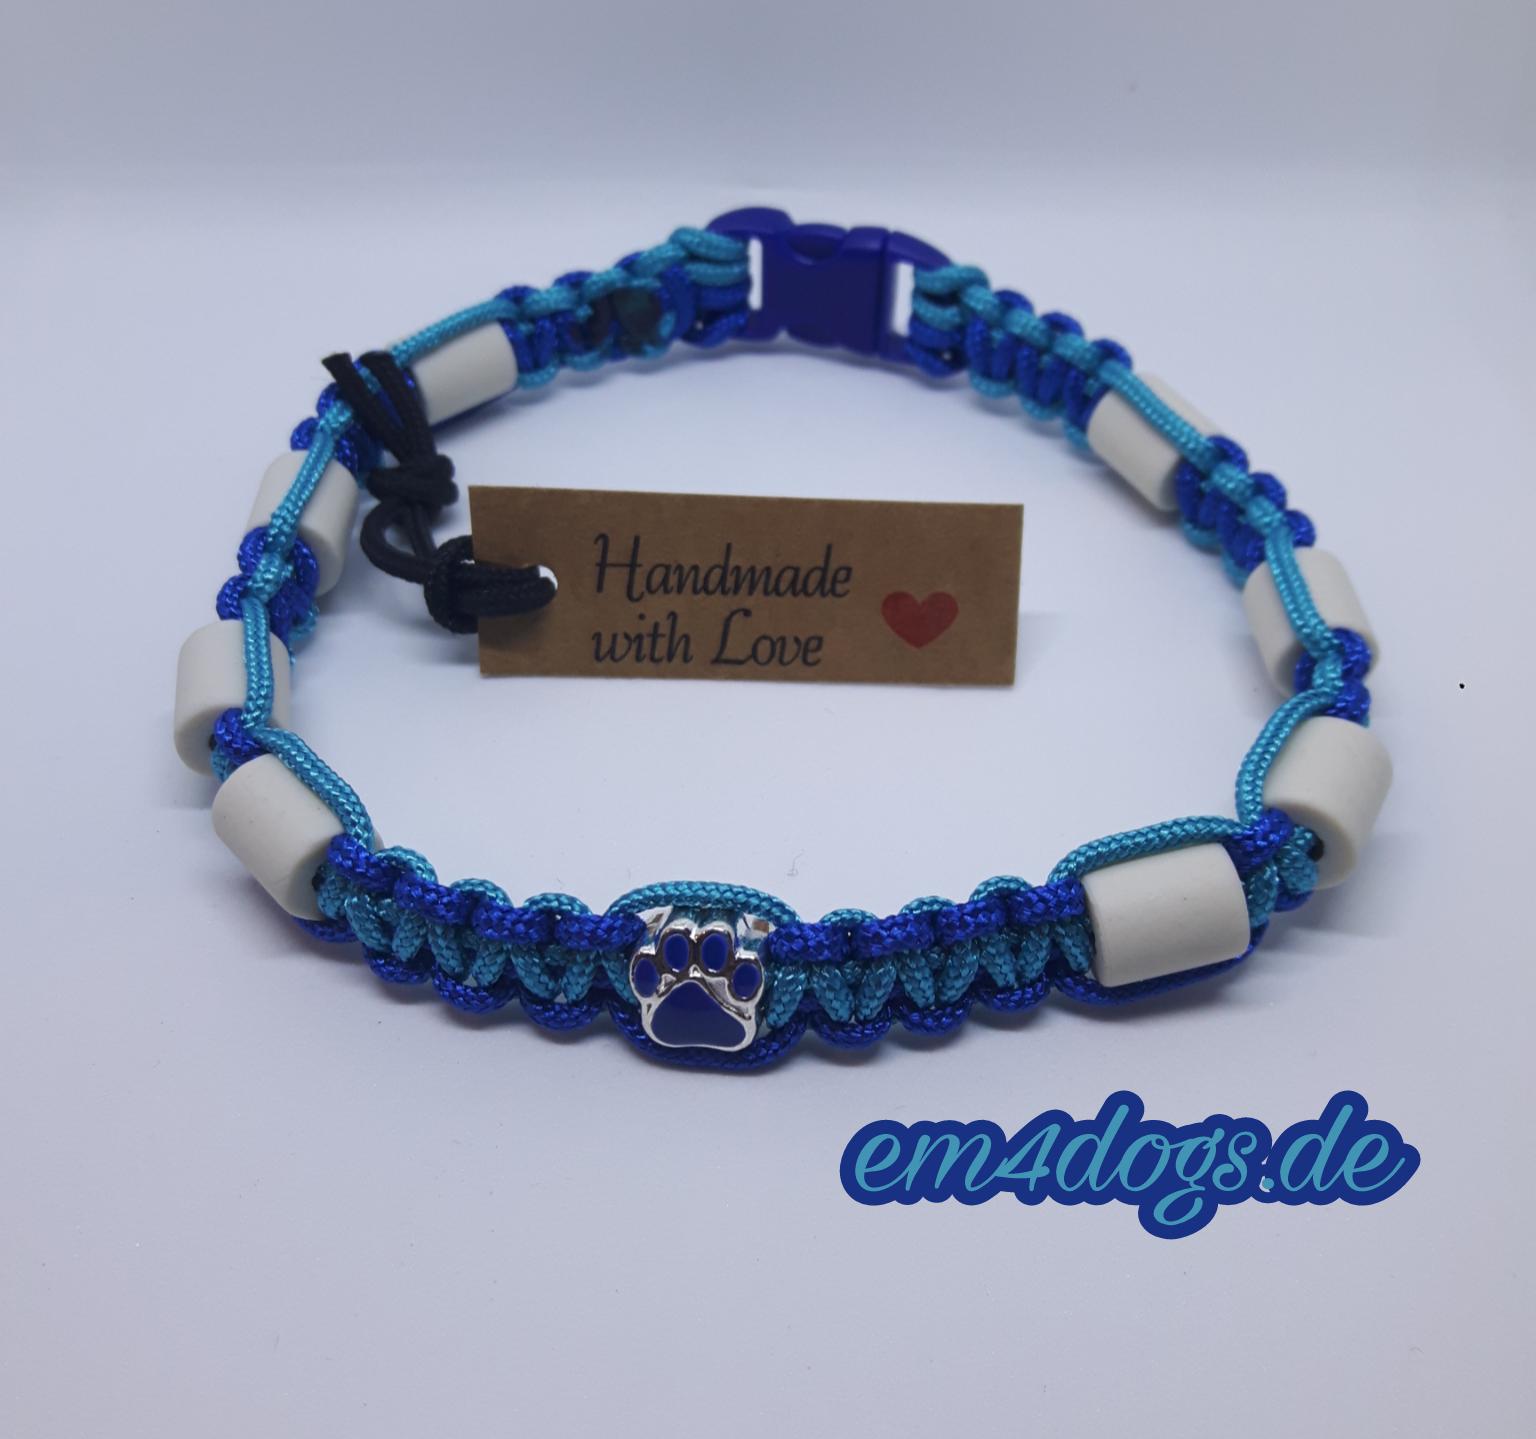 em4dogs.de EM-Keramik Hundehalsband dunkelblau türkis